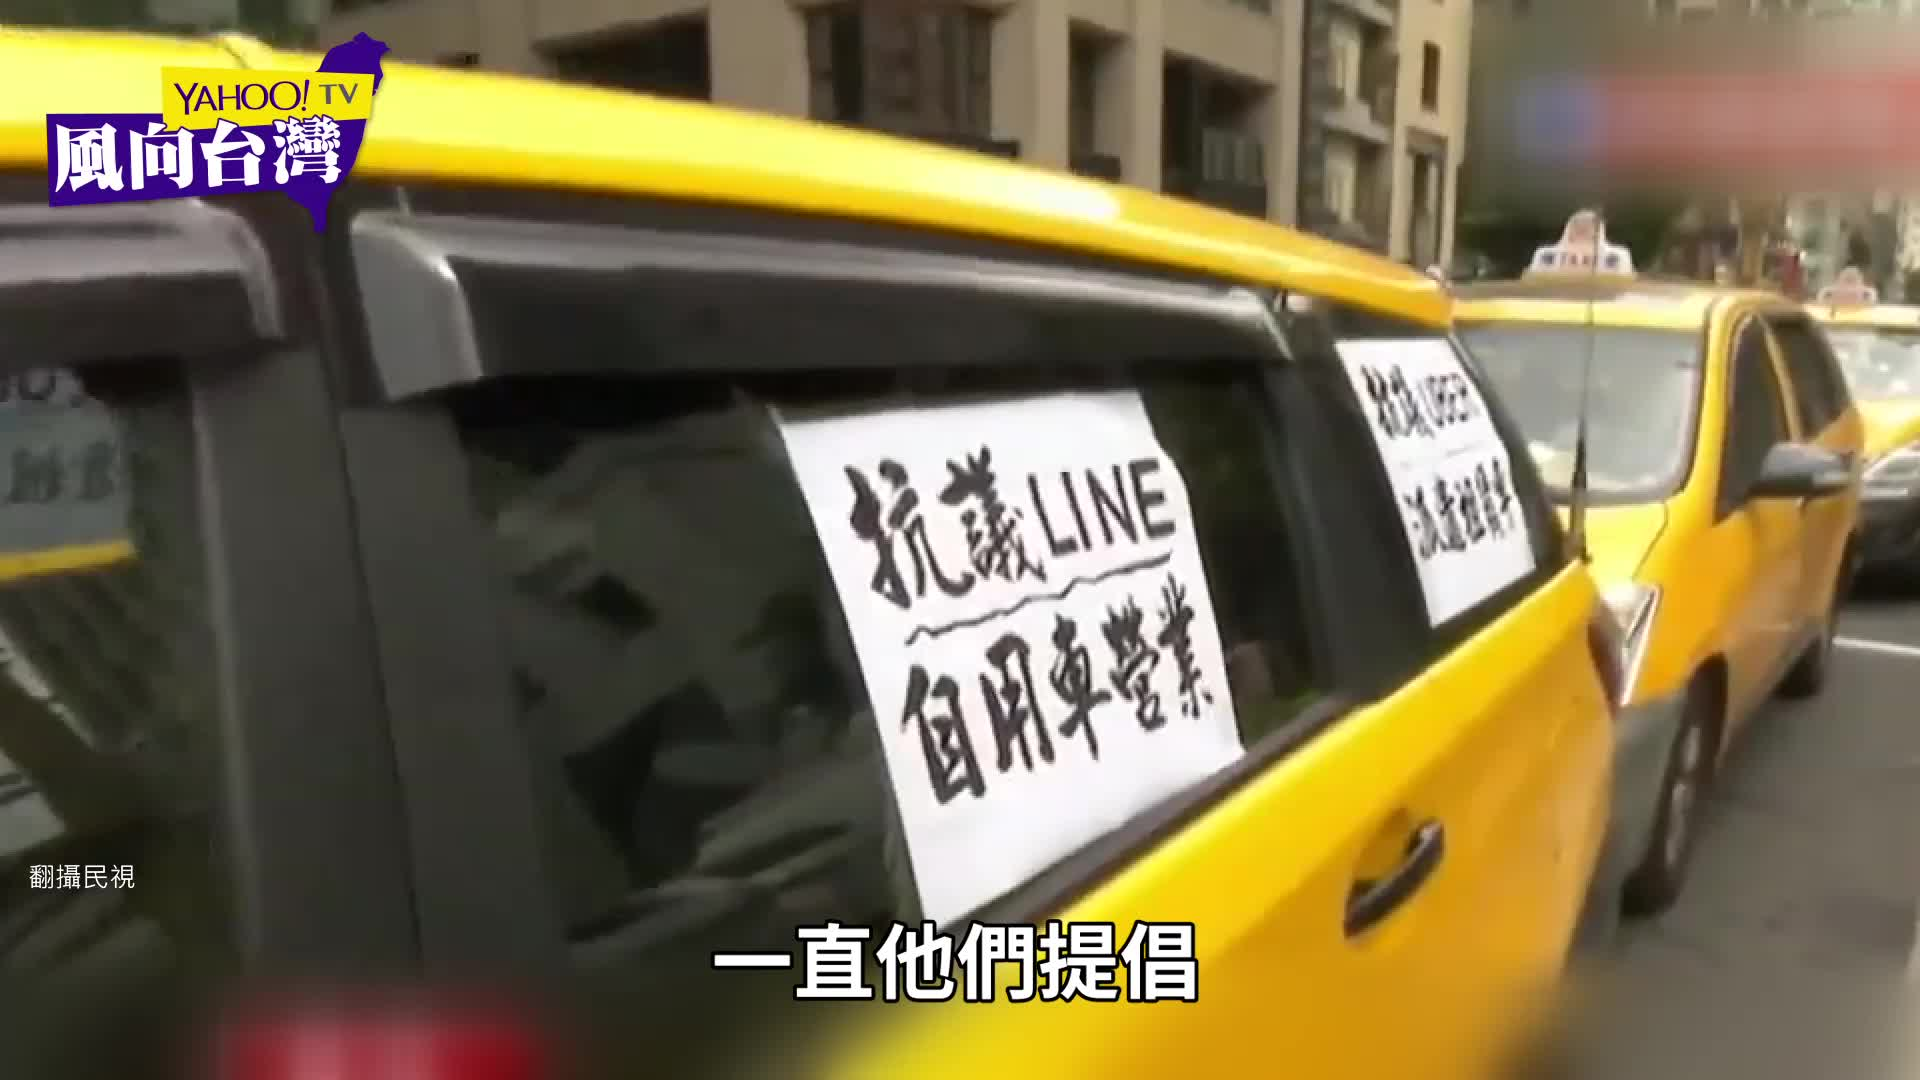 Uber 落日條款?他說政府應輔導小黃轉型跟新創競爭